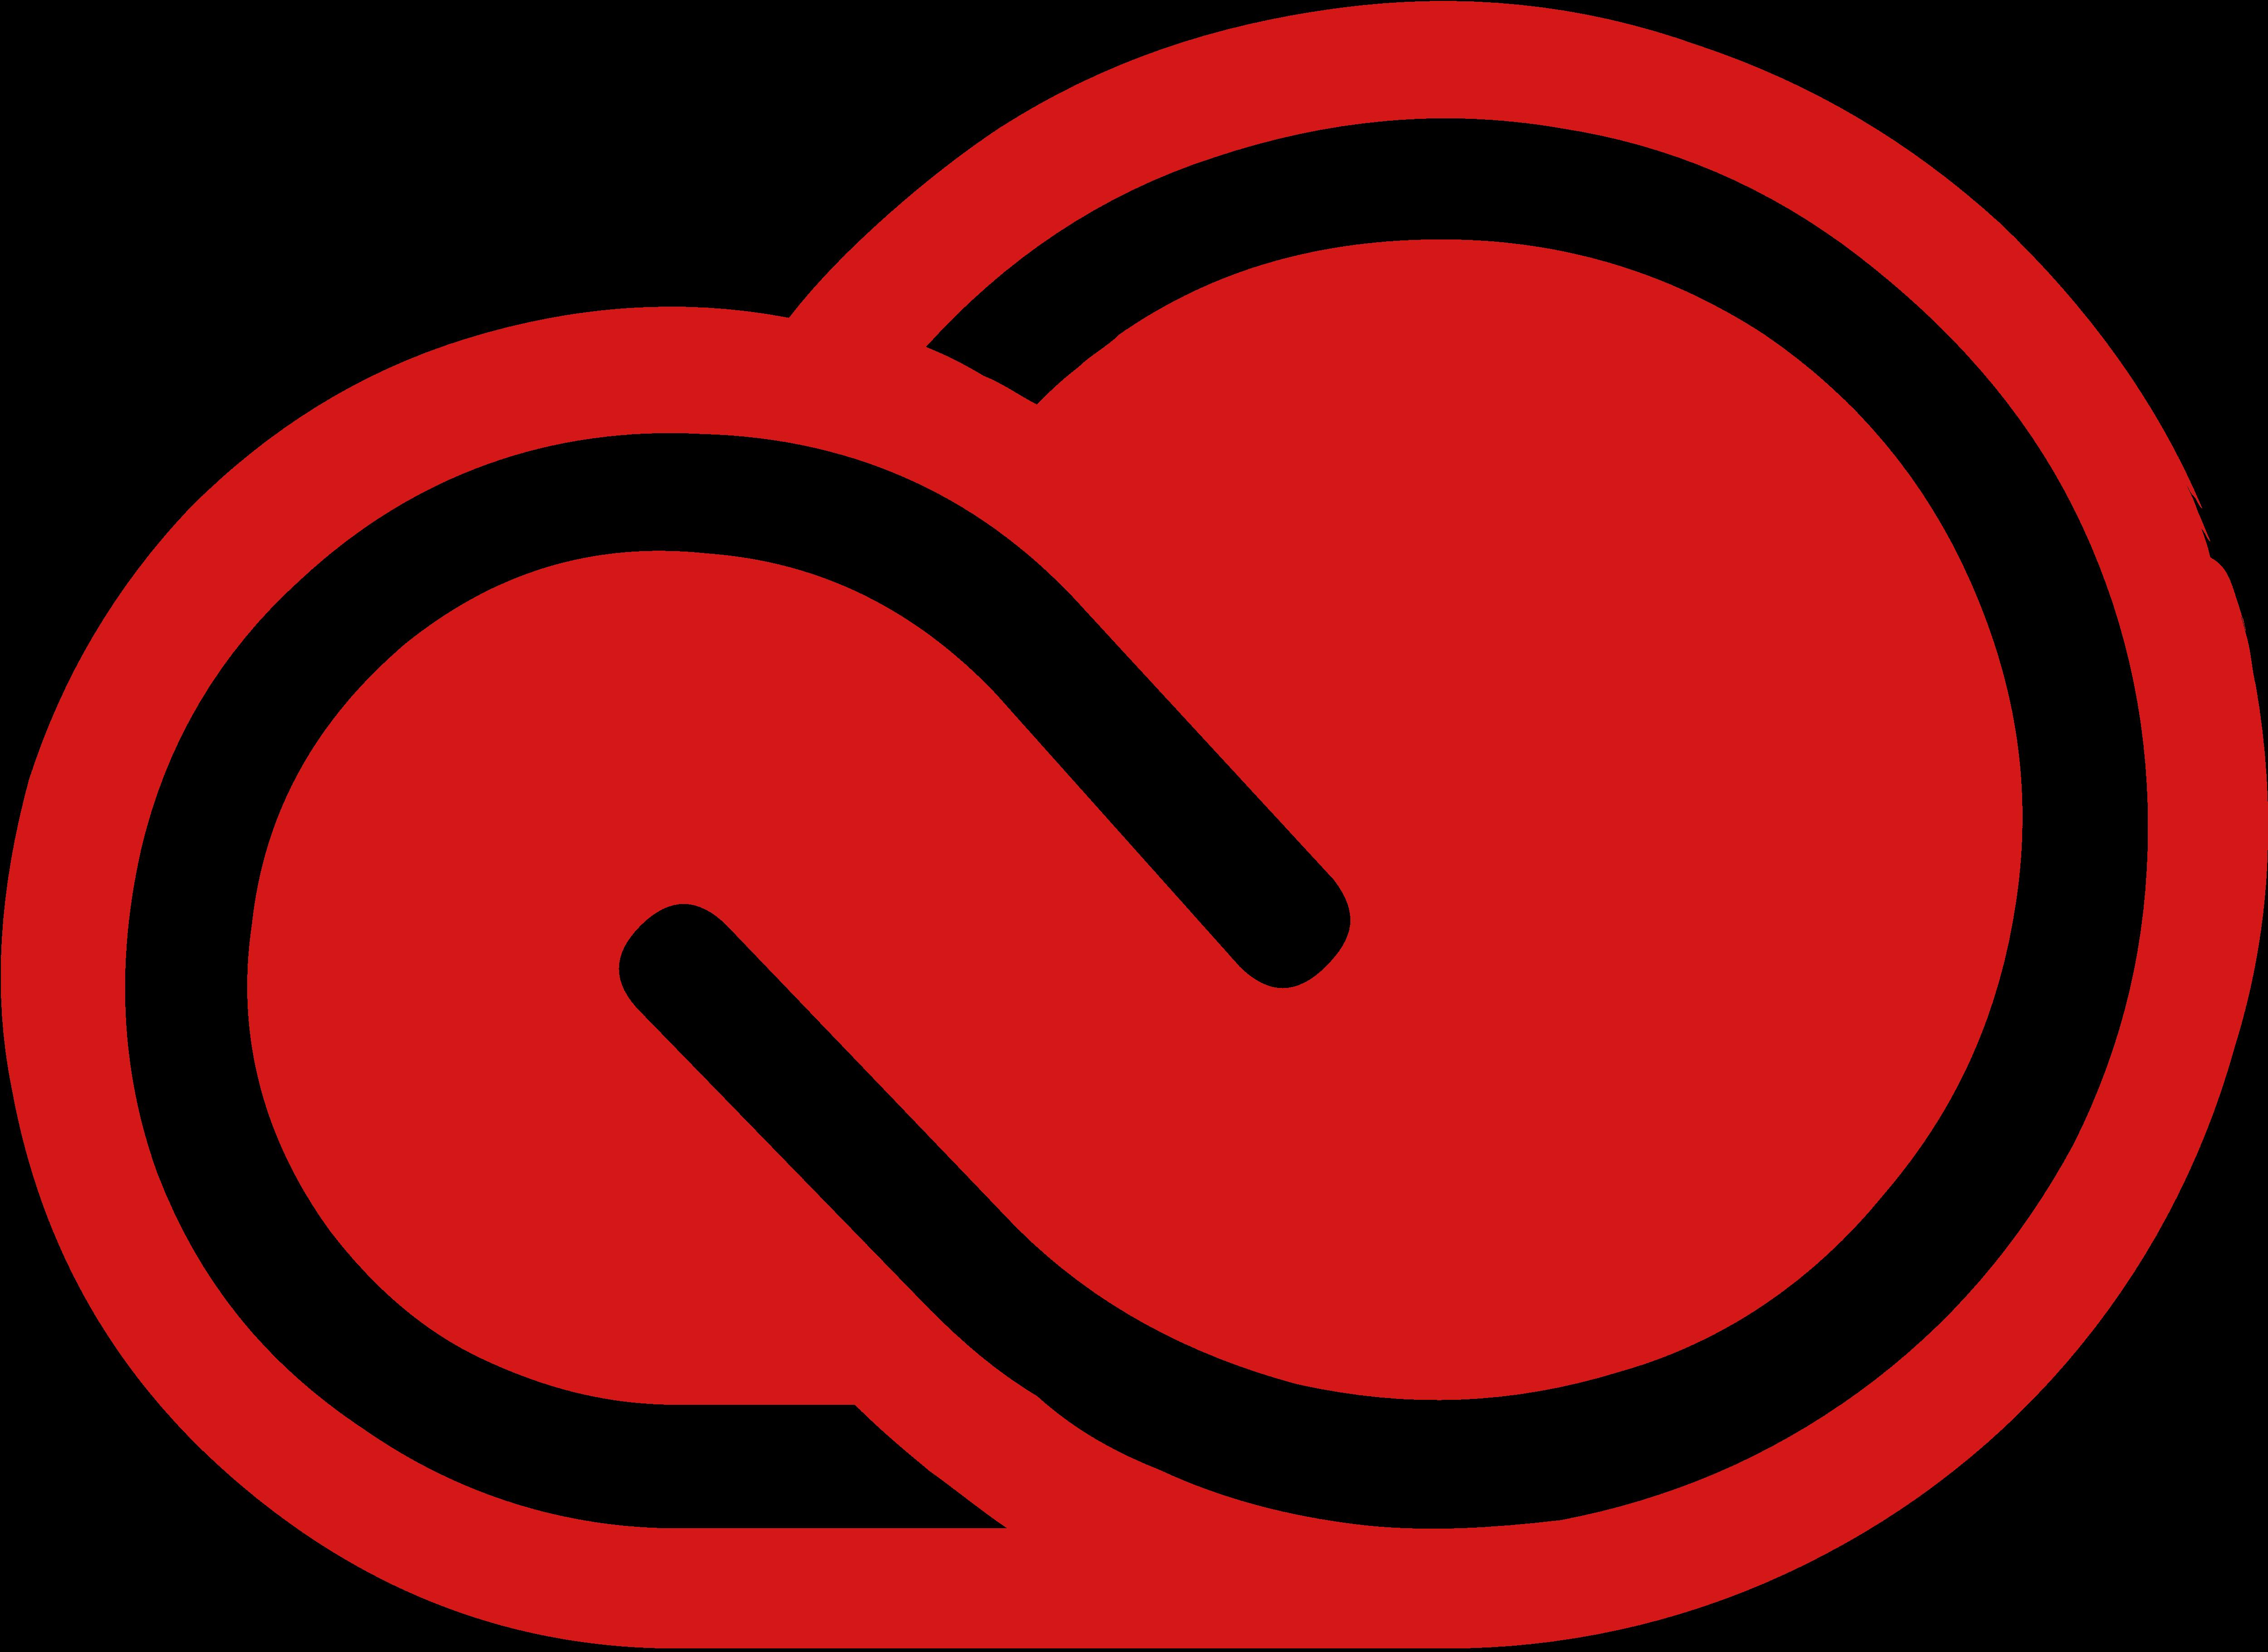 adobe creative cloud logo hd #1887